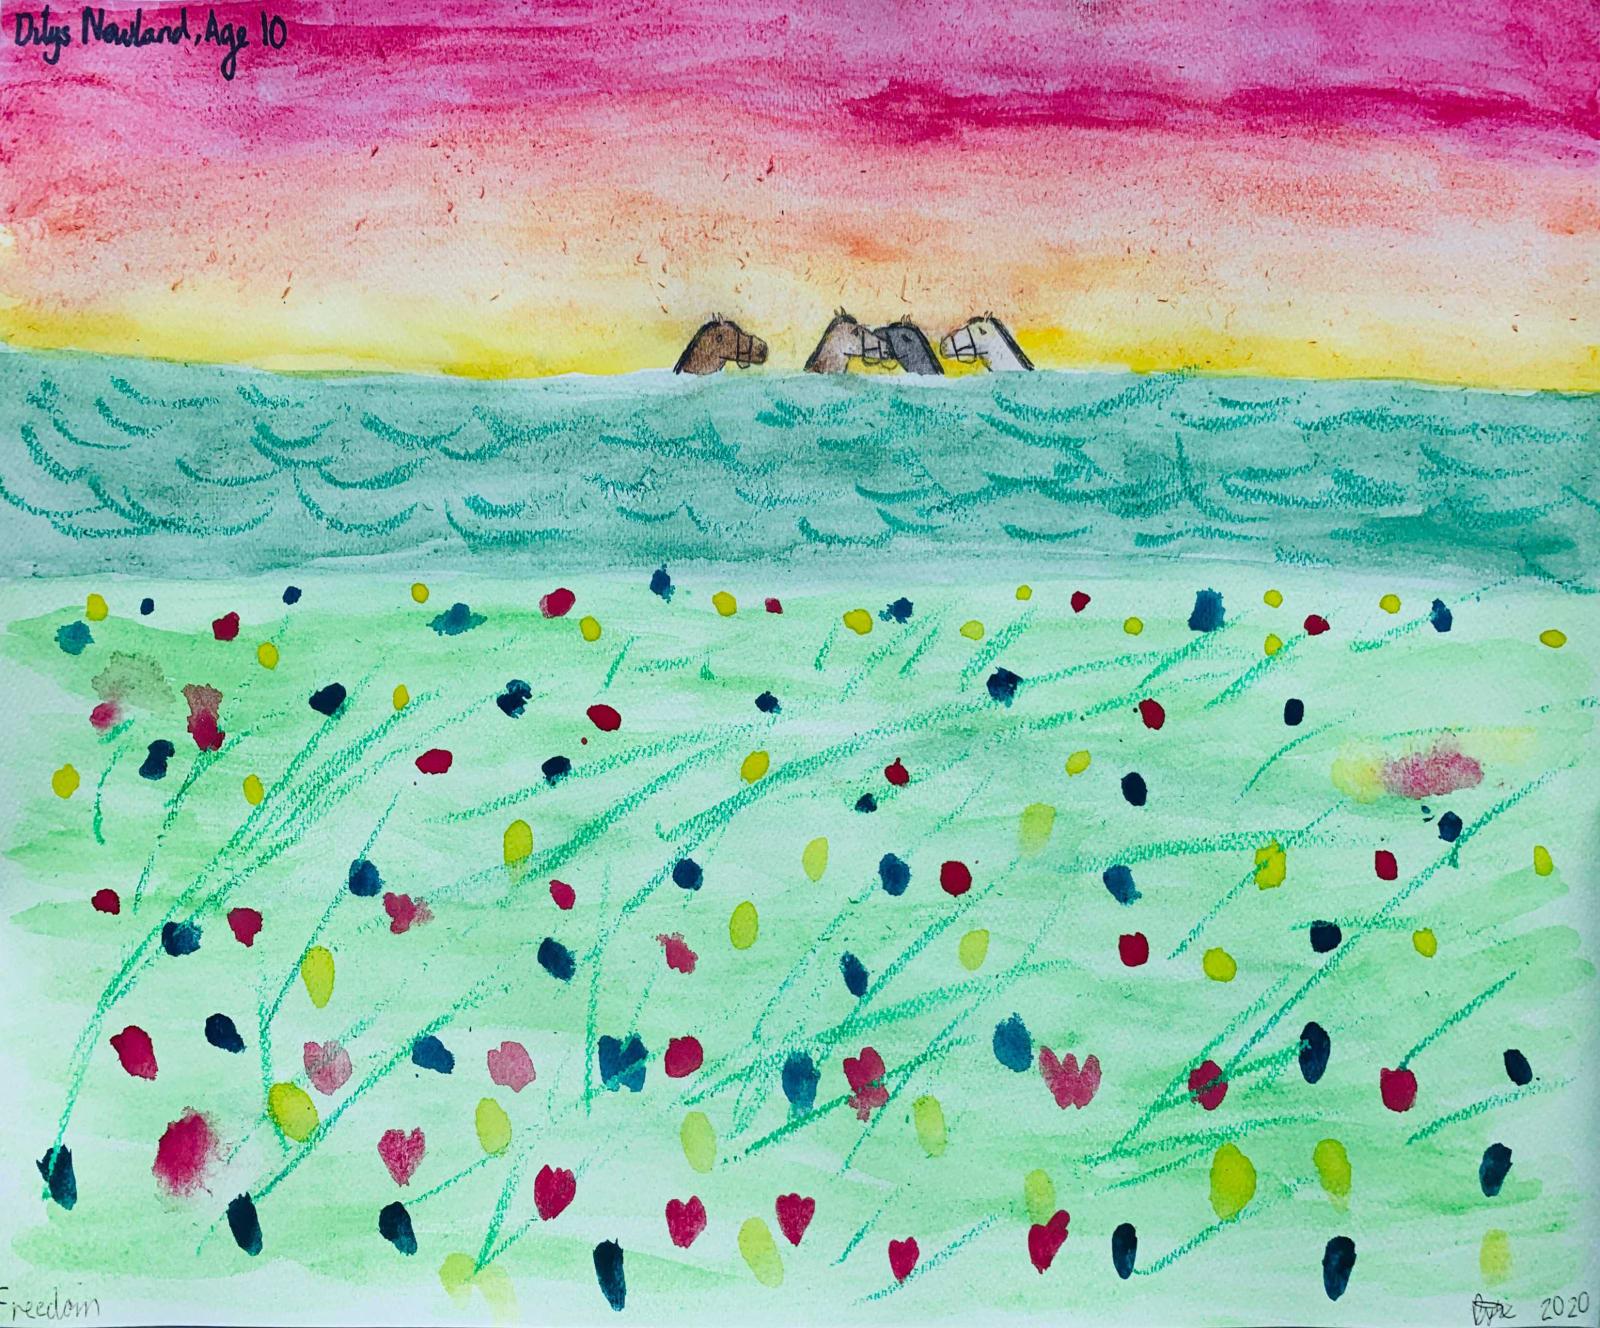 Dilys Newland, Age 10, Freedom